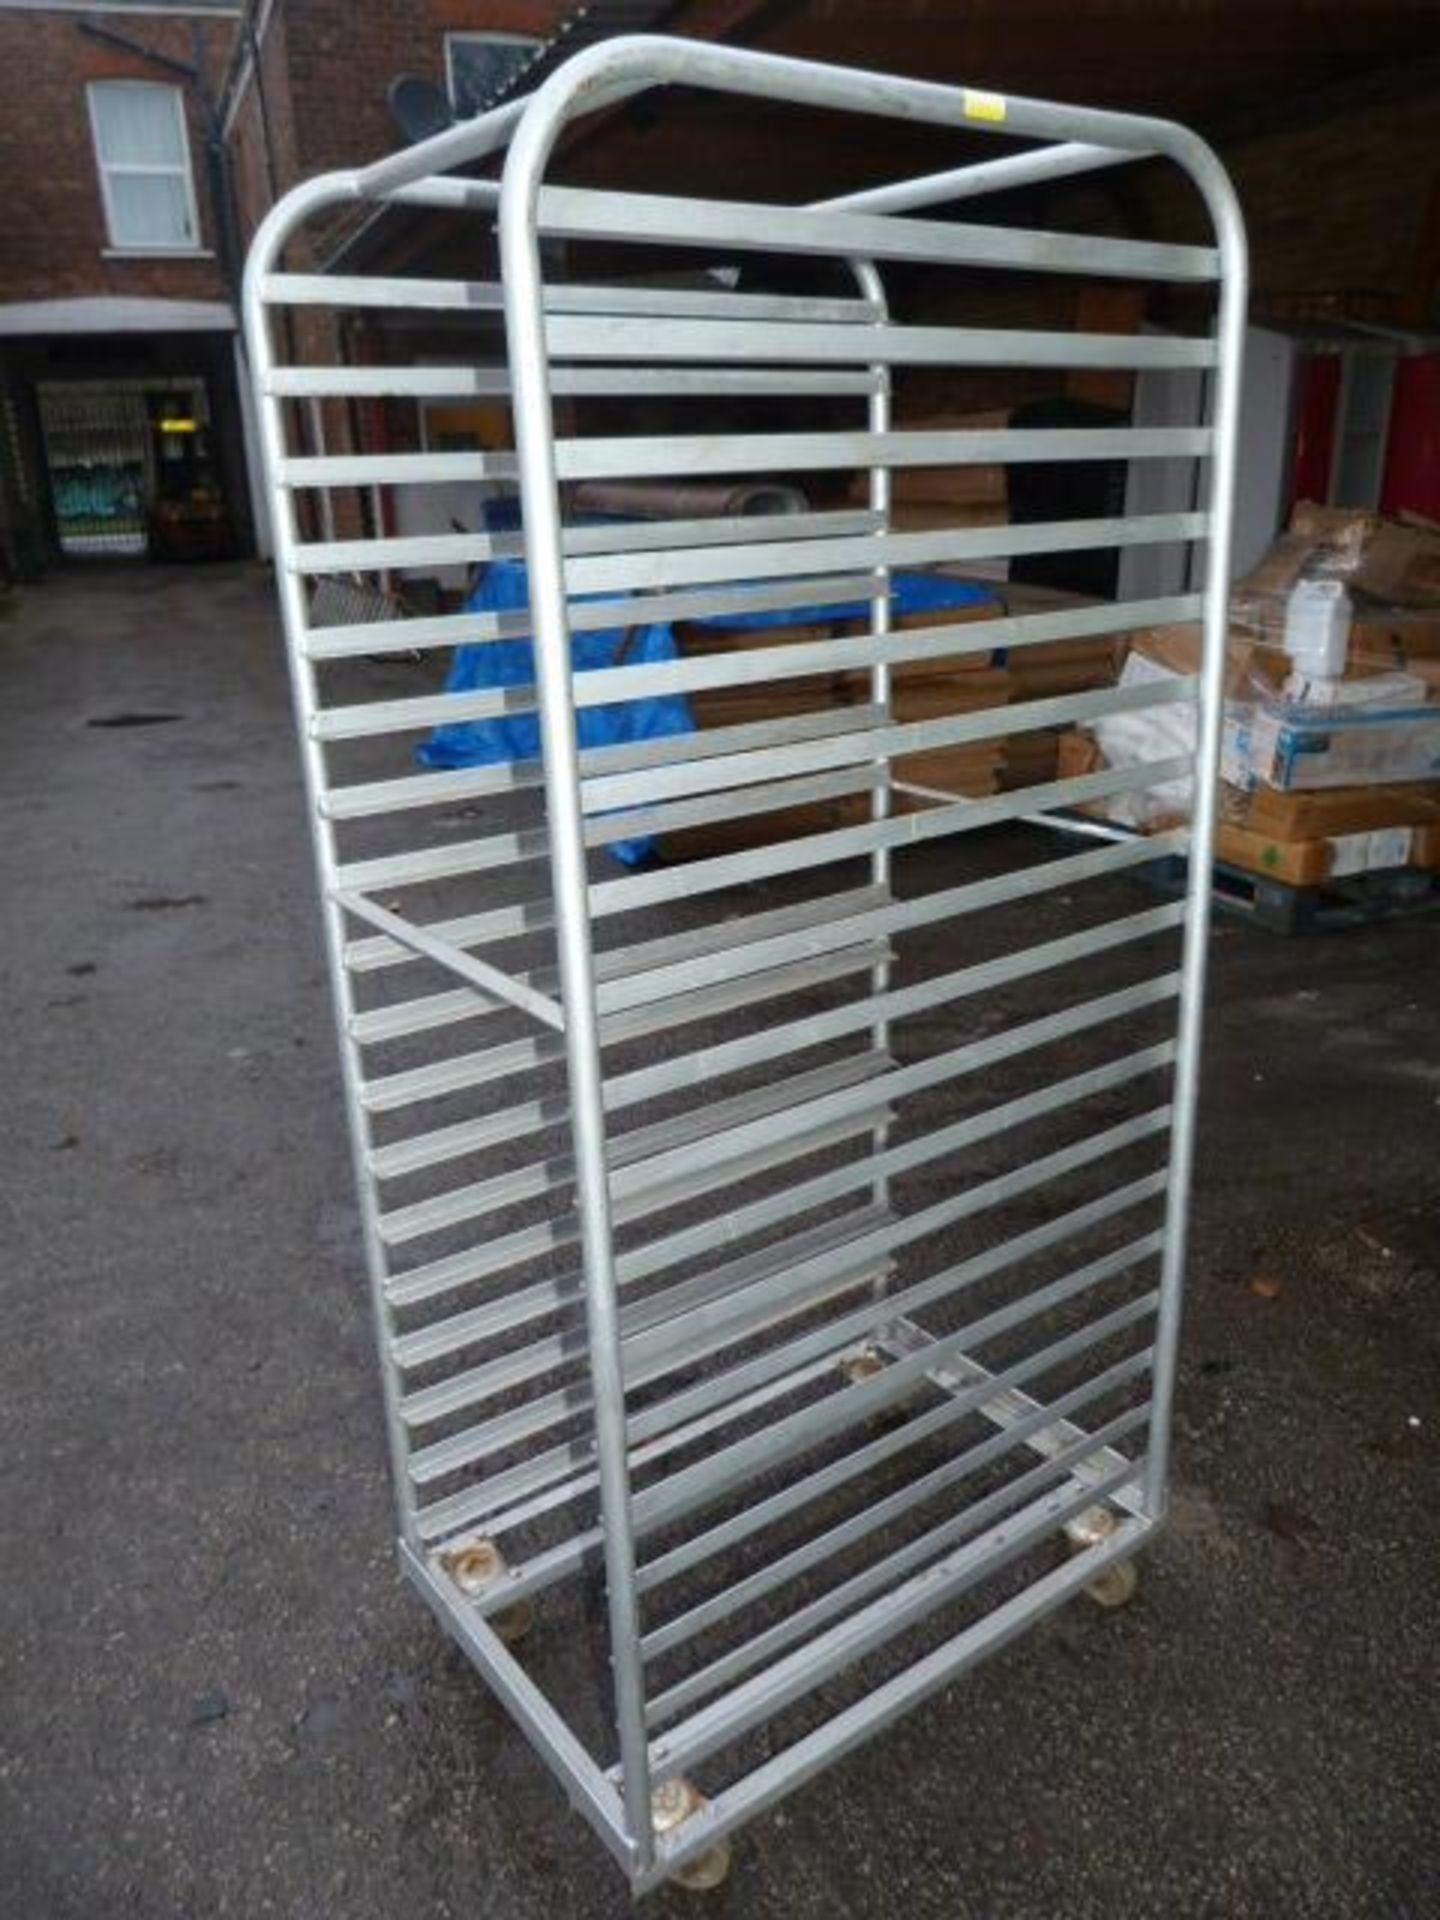 Bakery Tray Rack for Eighteen Trays